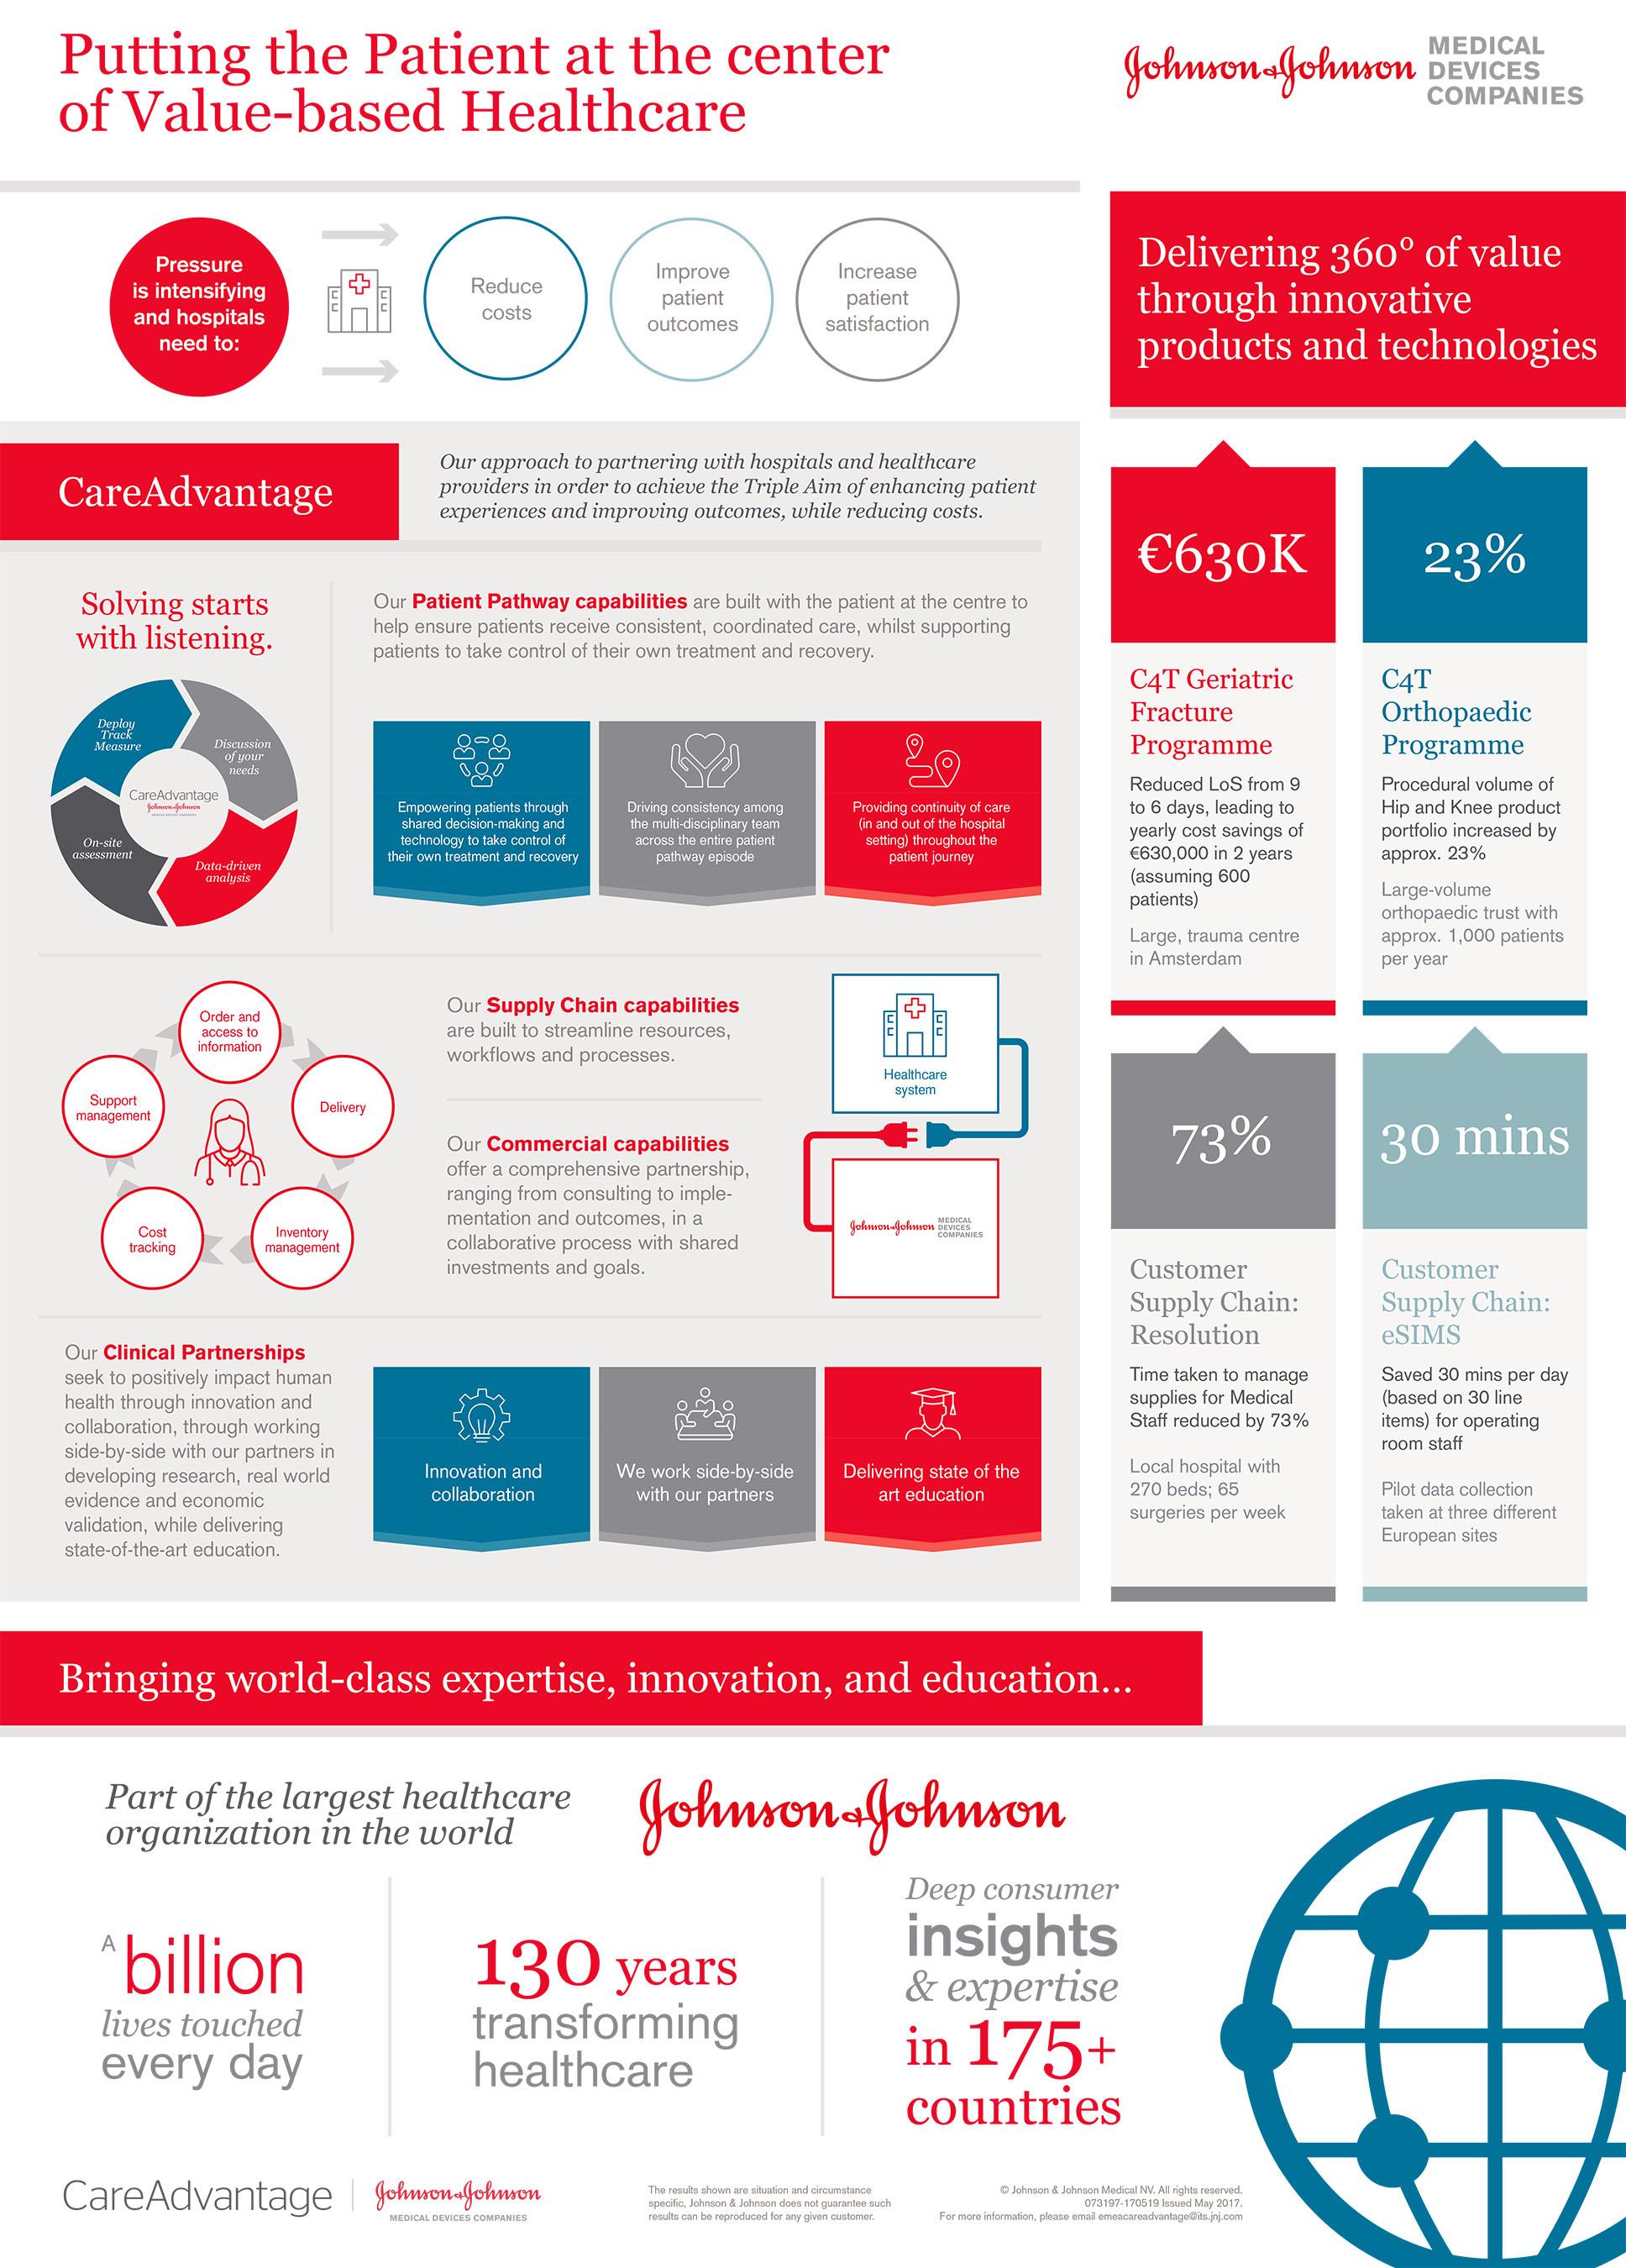 Johnson & Johnson Medical Devices Launches CareAdvantage